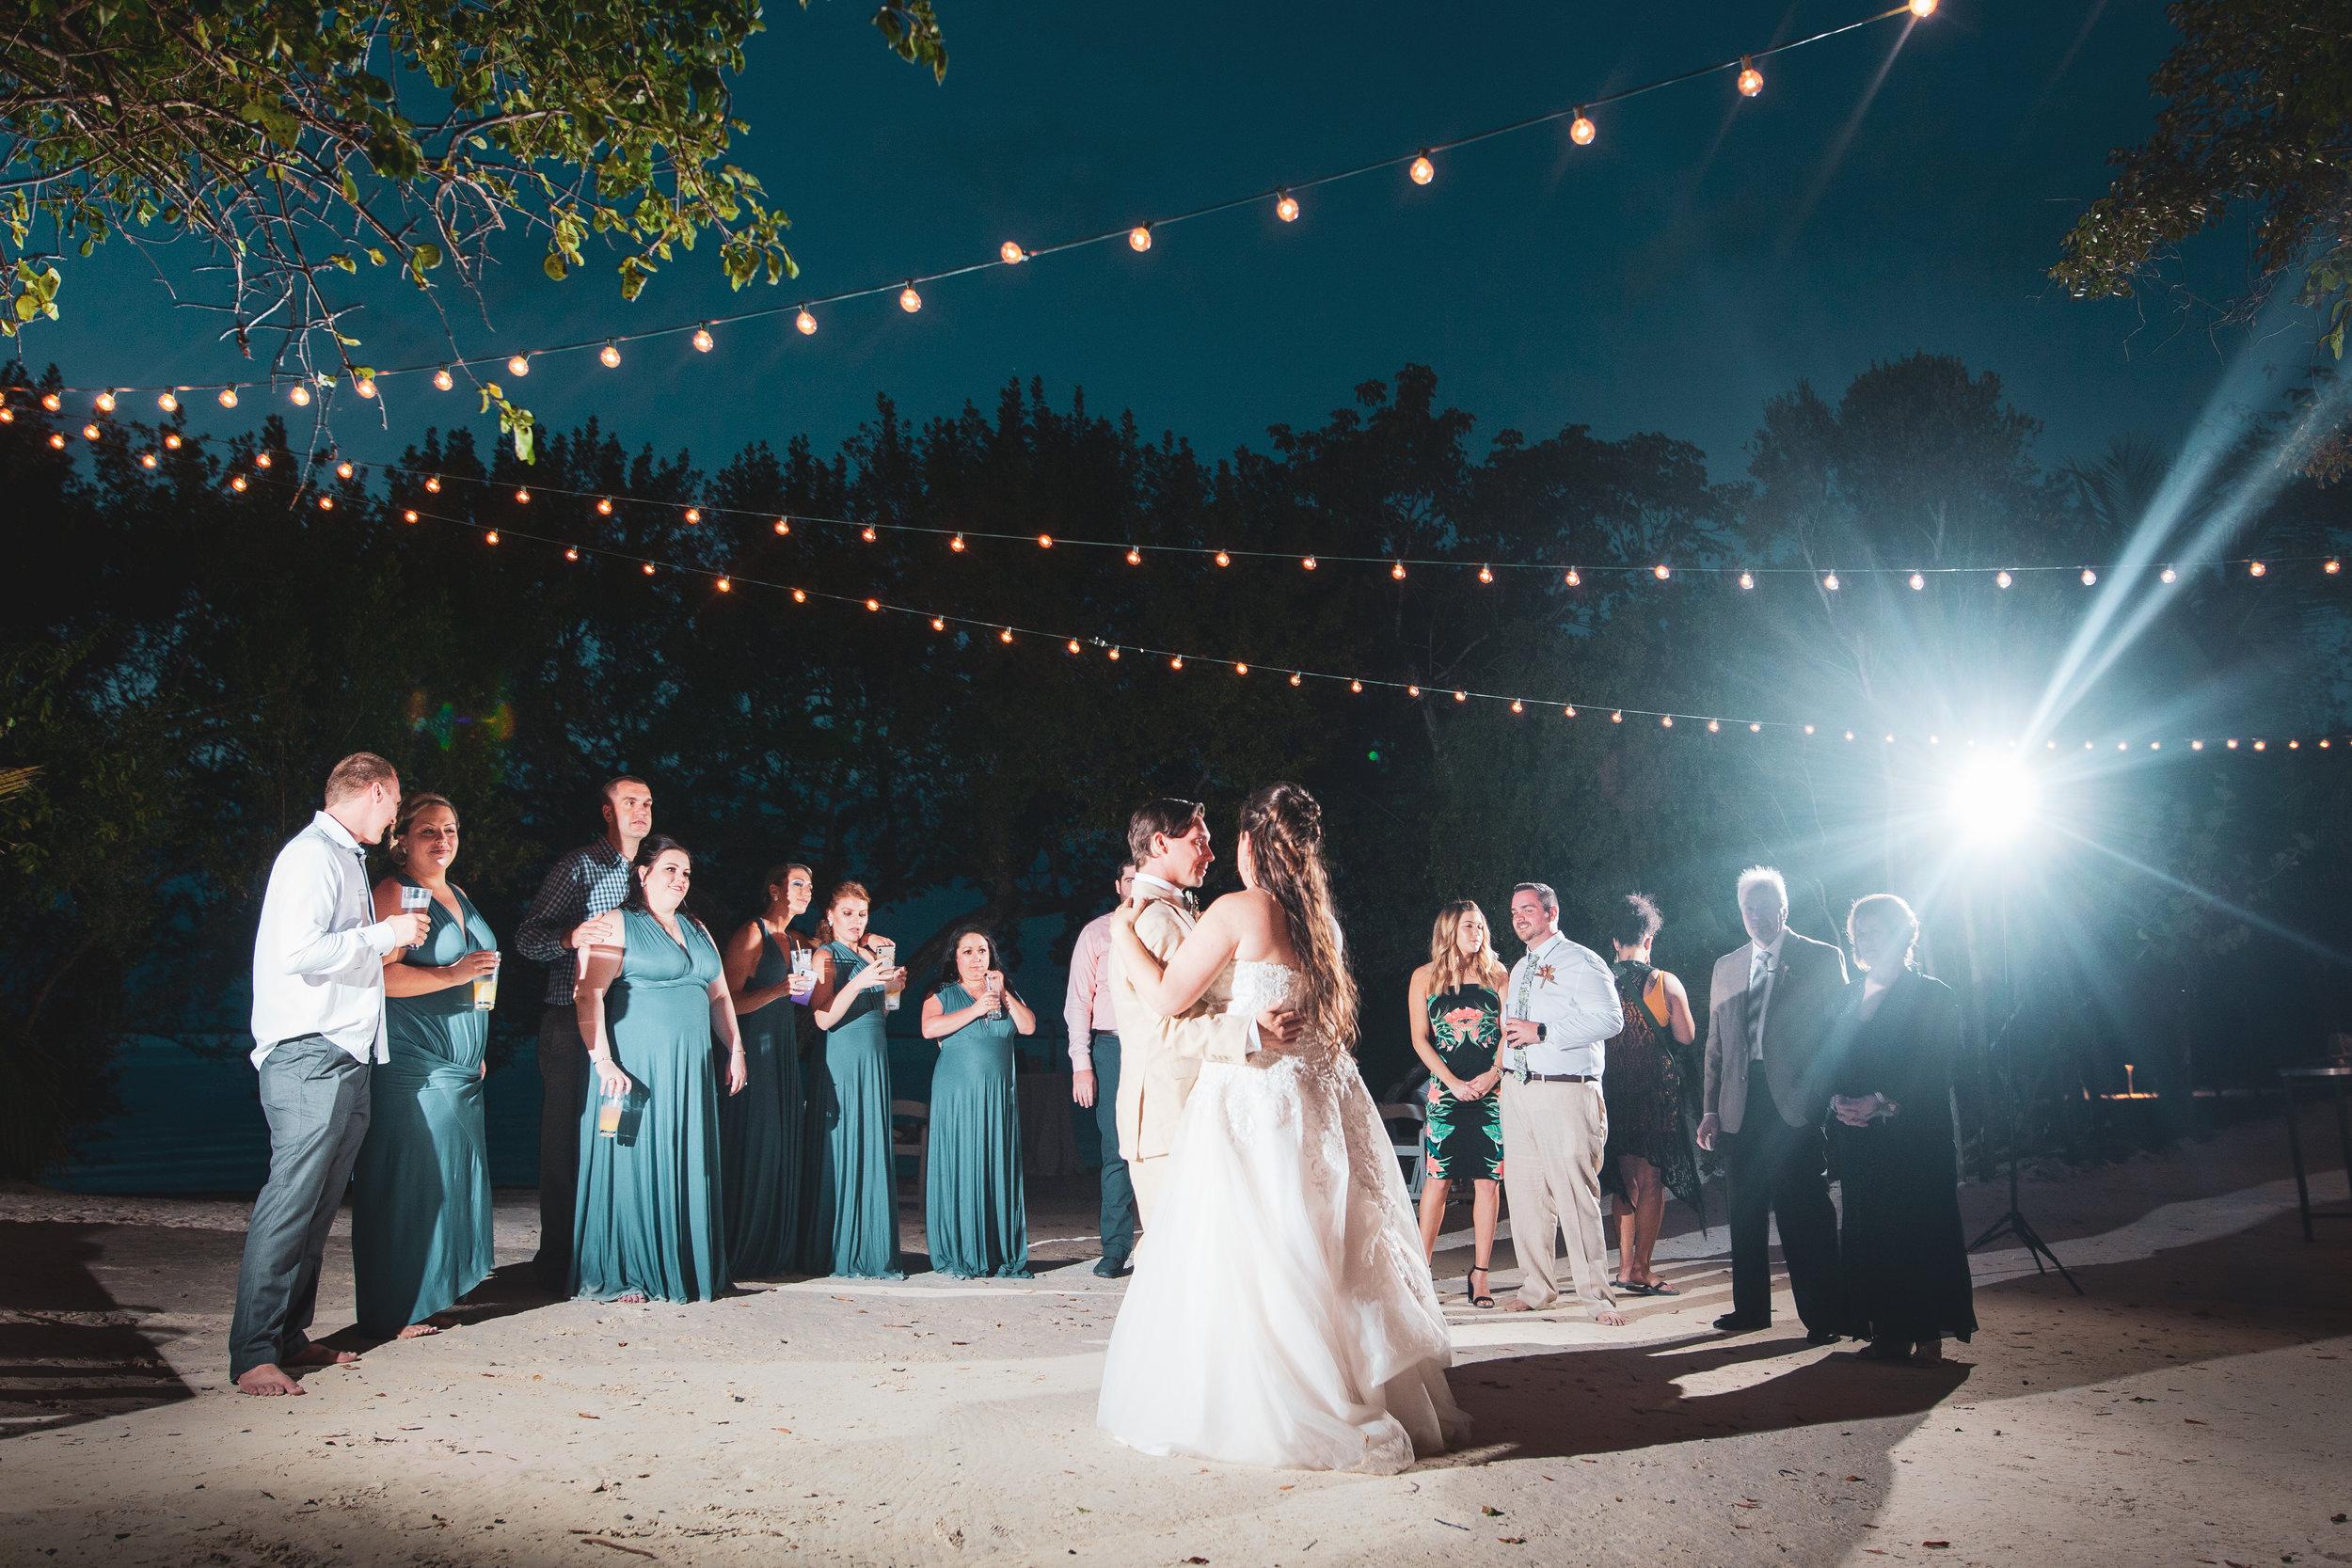 key largo florida beach wedding © kelilina photography 20190316185032-1.jpg